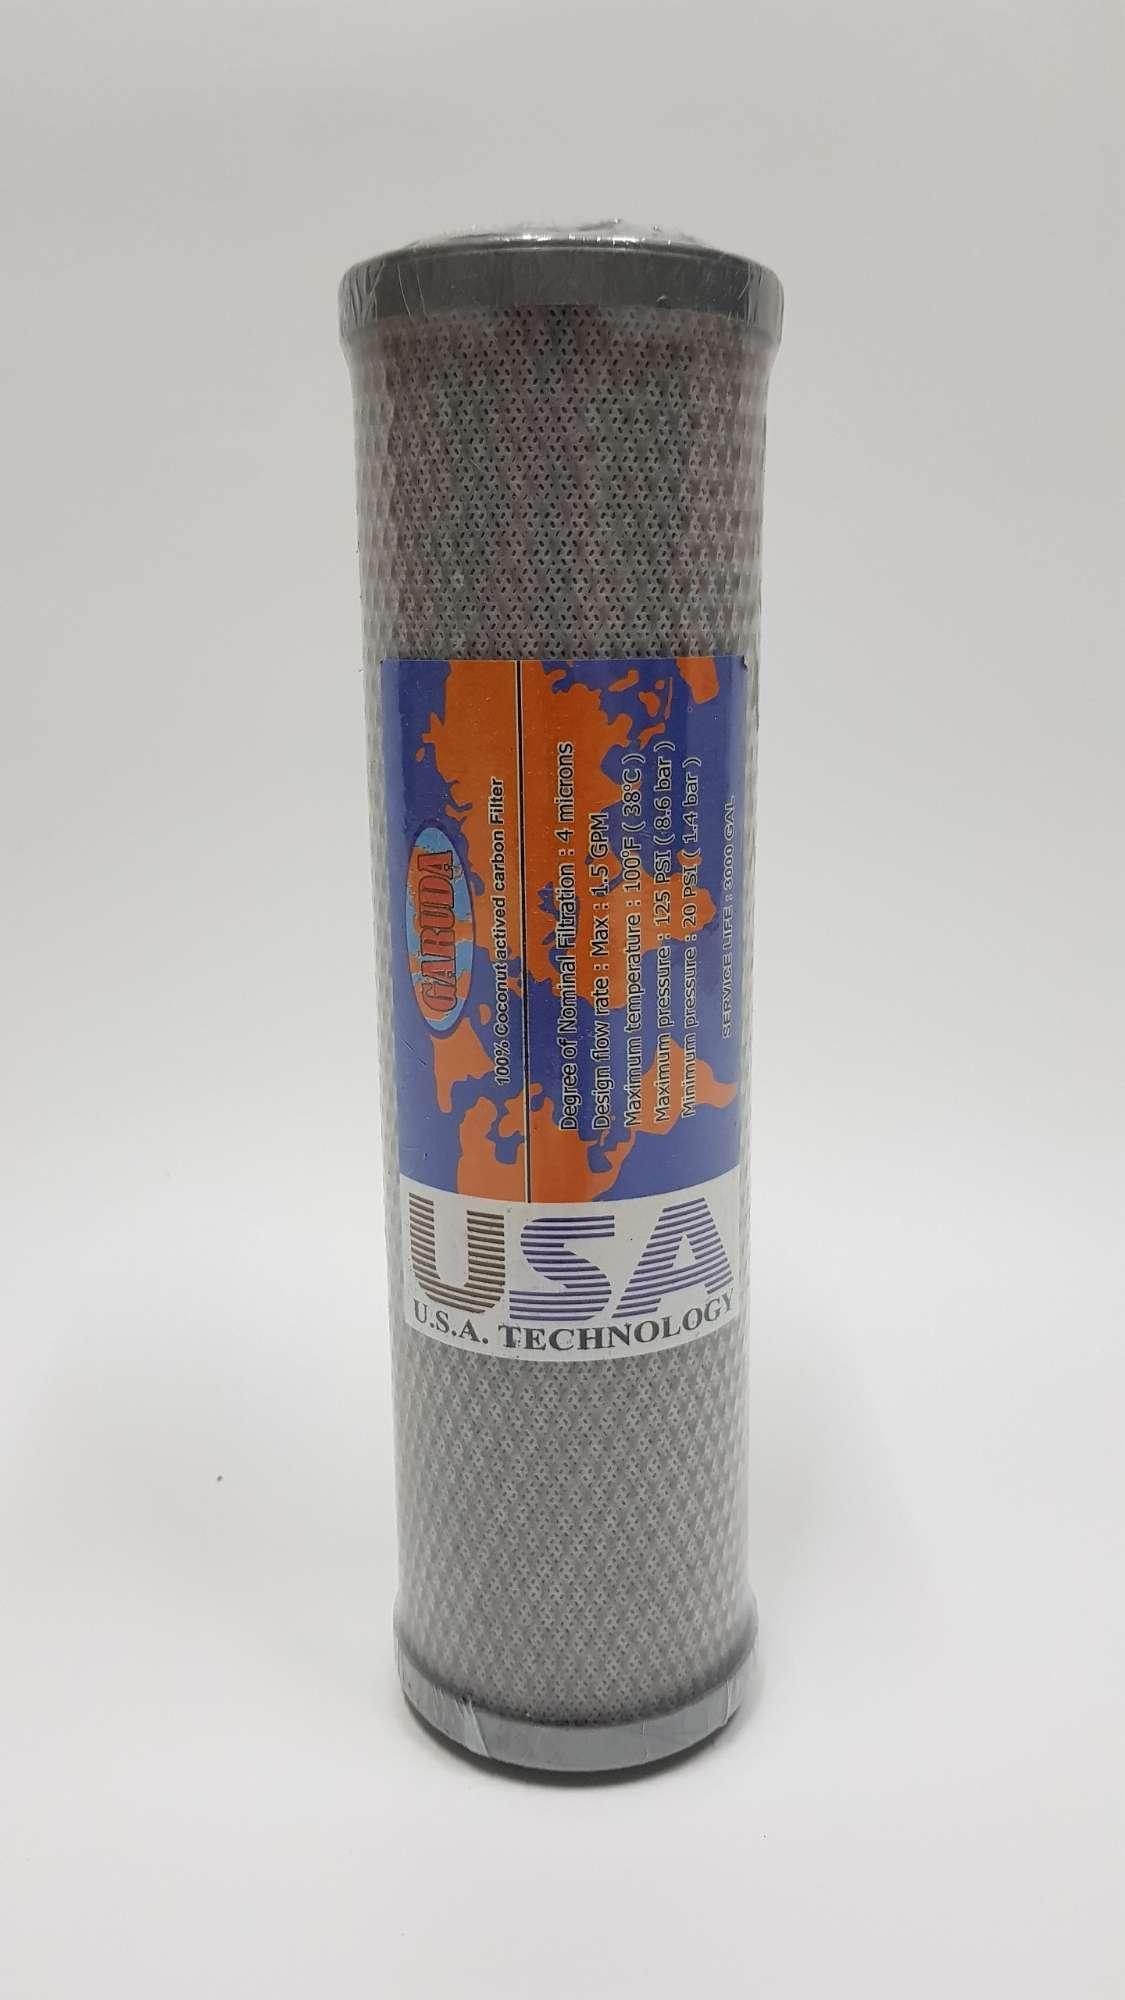 CTO Garuda Karbon Blok 10 inch